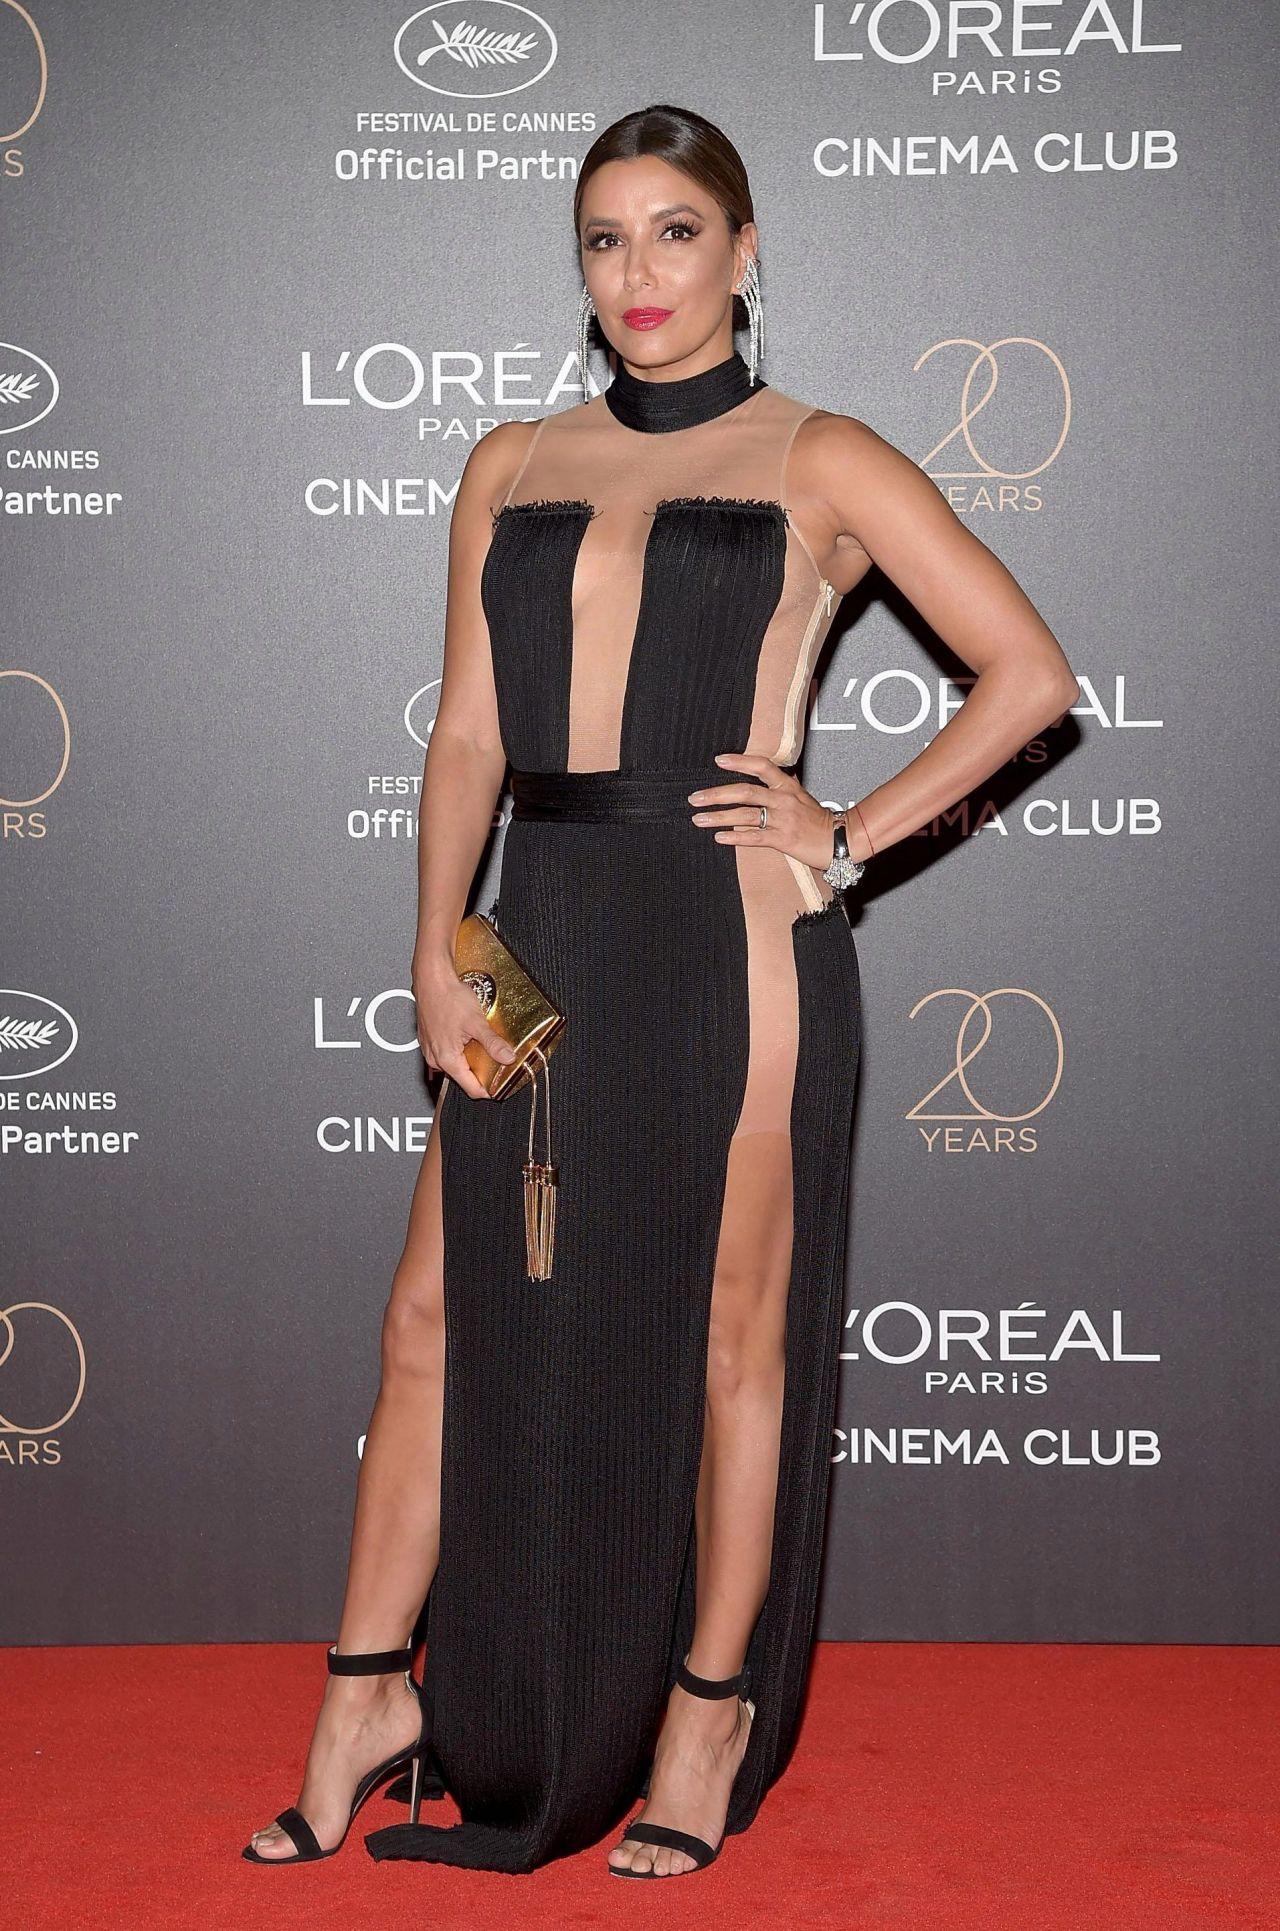 Eva Longoria On Red Carpet L Oreal 20th Anniversary